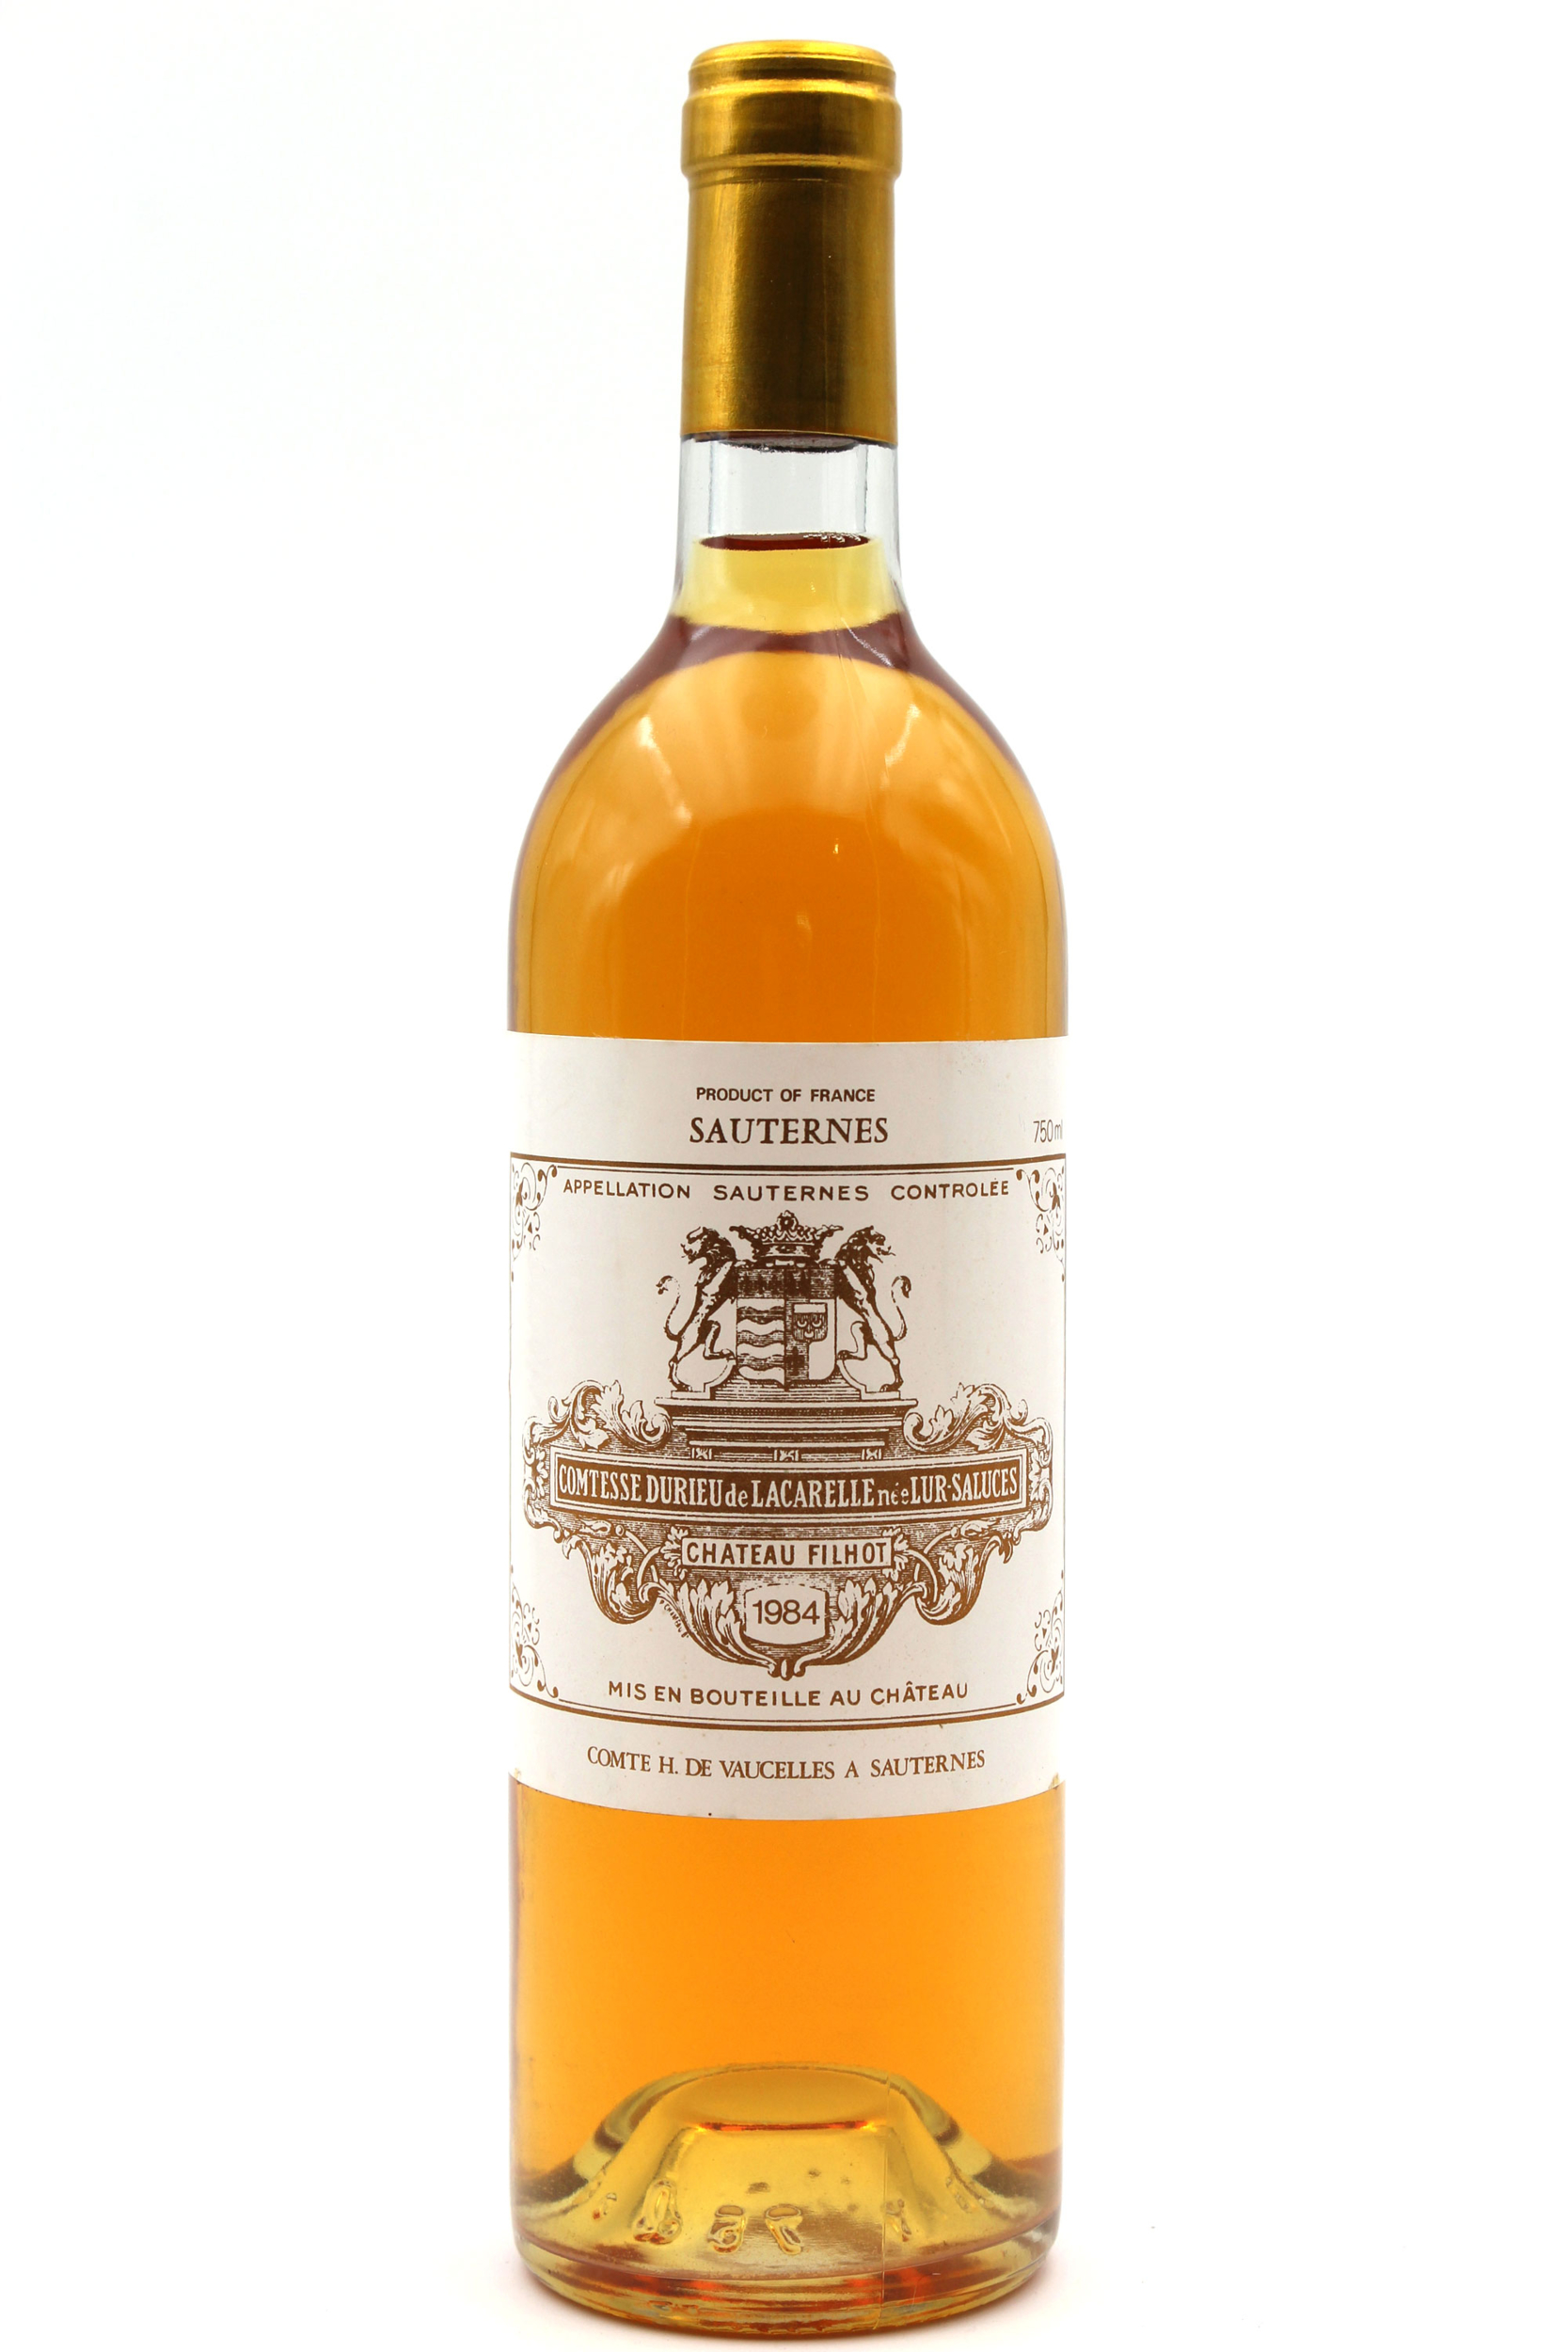 Château Filhot GCC 1984 Blanc 75cl AOC Sauternes